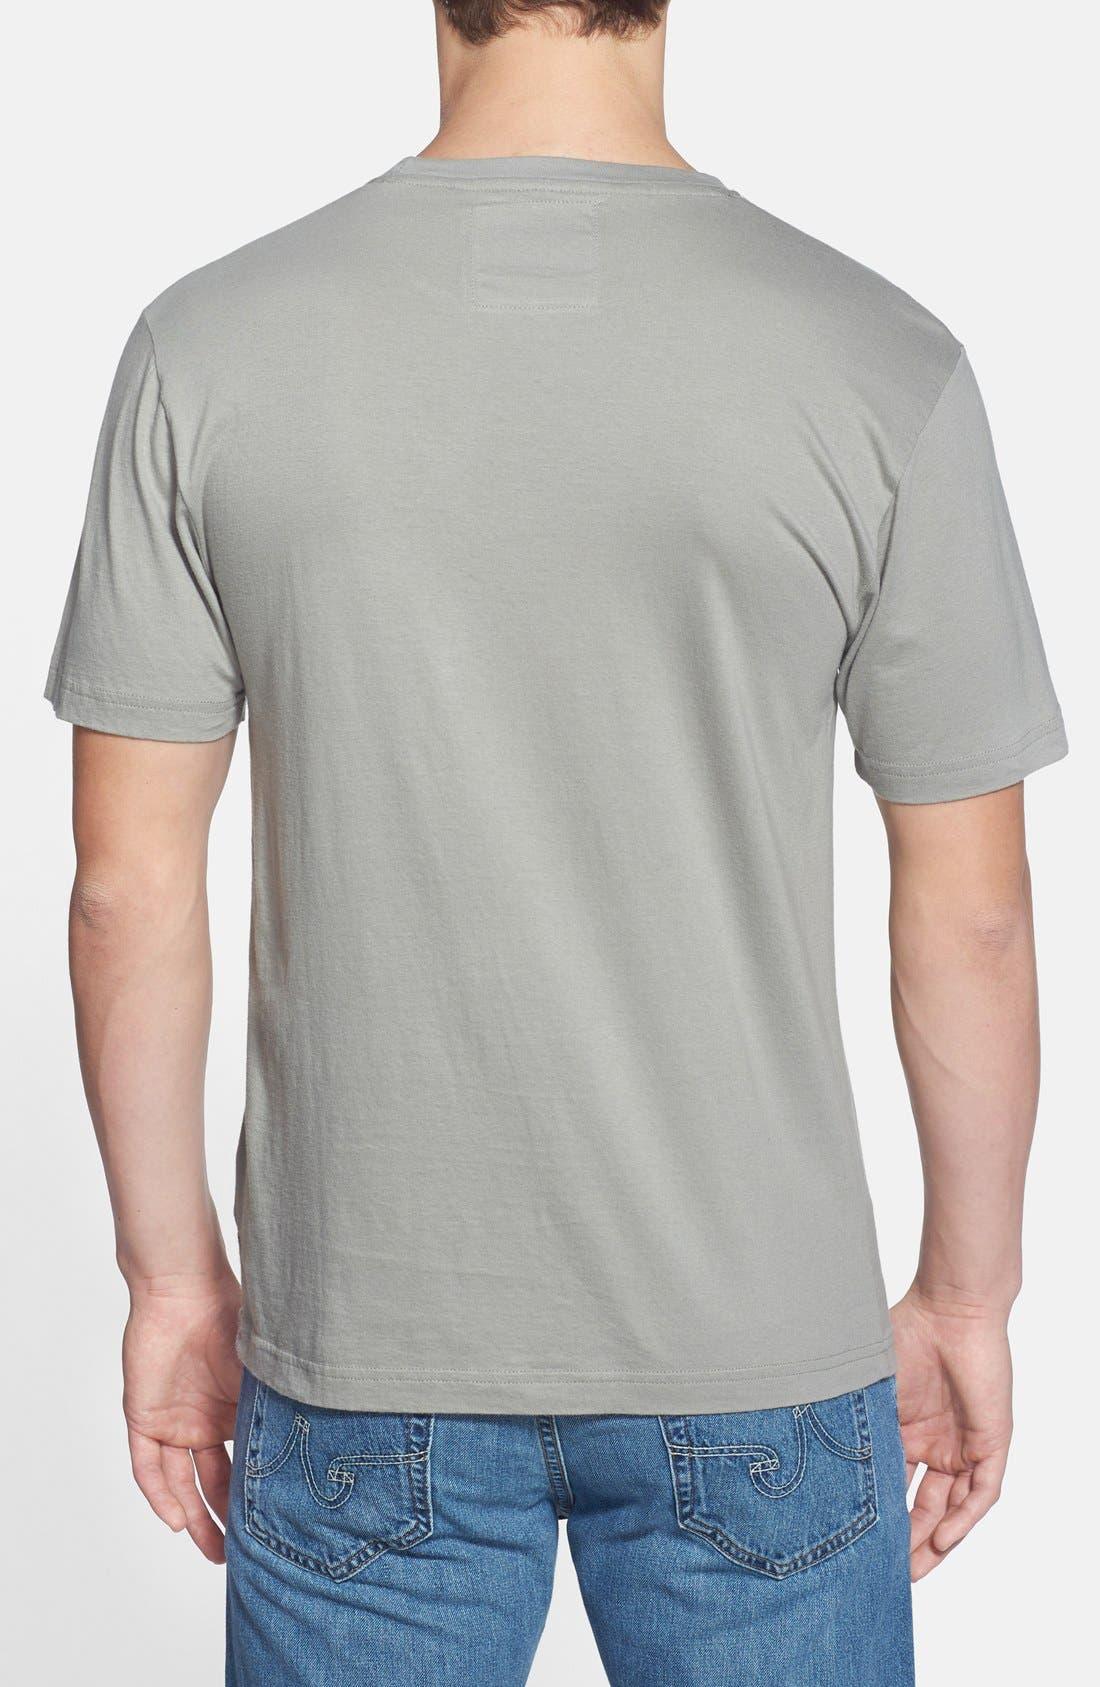 'St. Louis Cardinals - Brass Tacks' T-Shirt,                             Alternate thumbnail 3, color,                             020